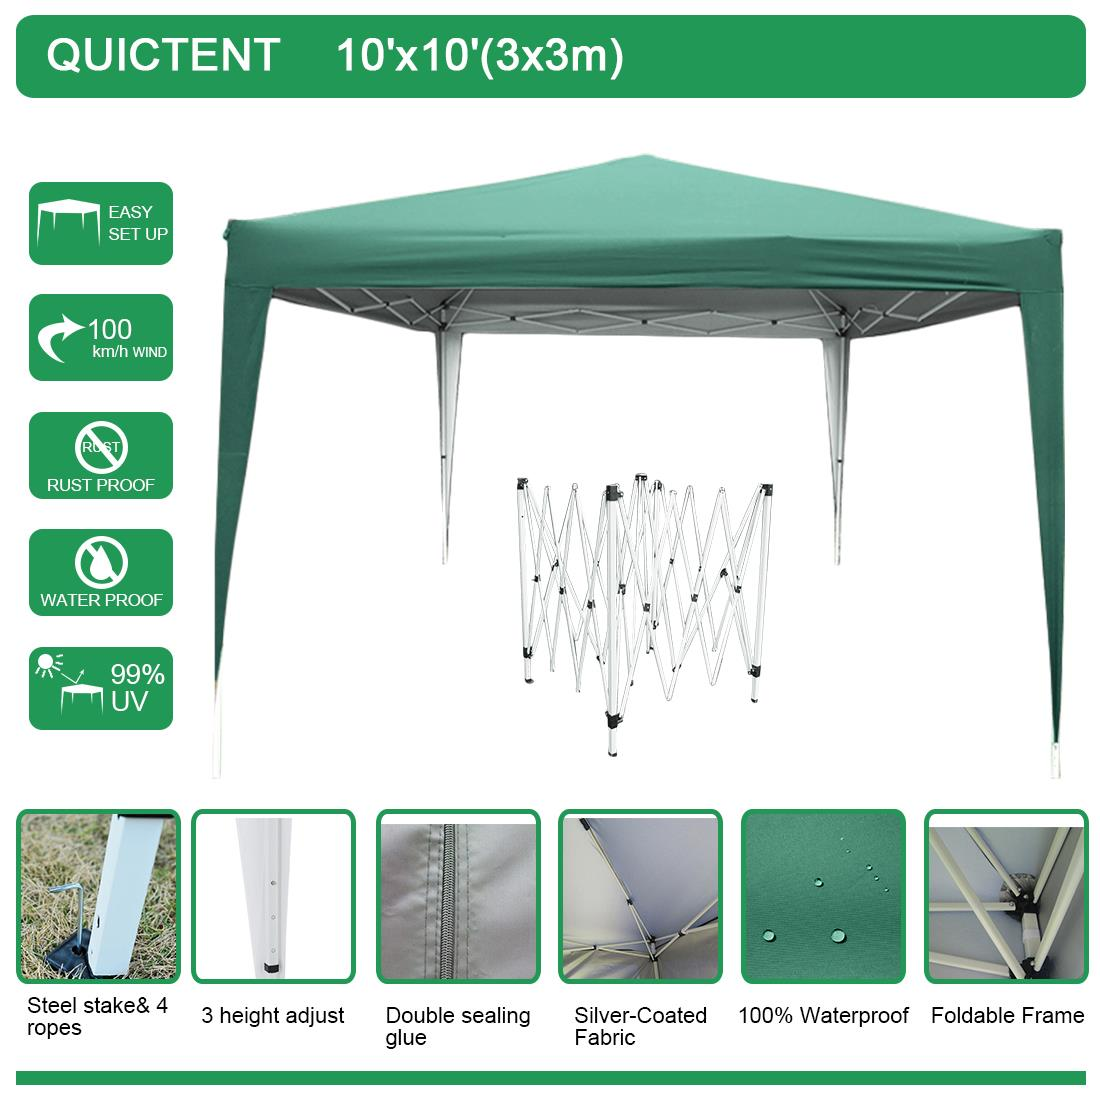 Quictent 10x10 EZ Pop Up Canopy Folding Gazebo Tent Sun ...